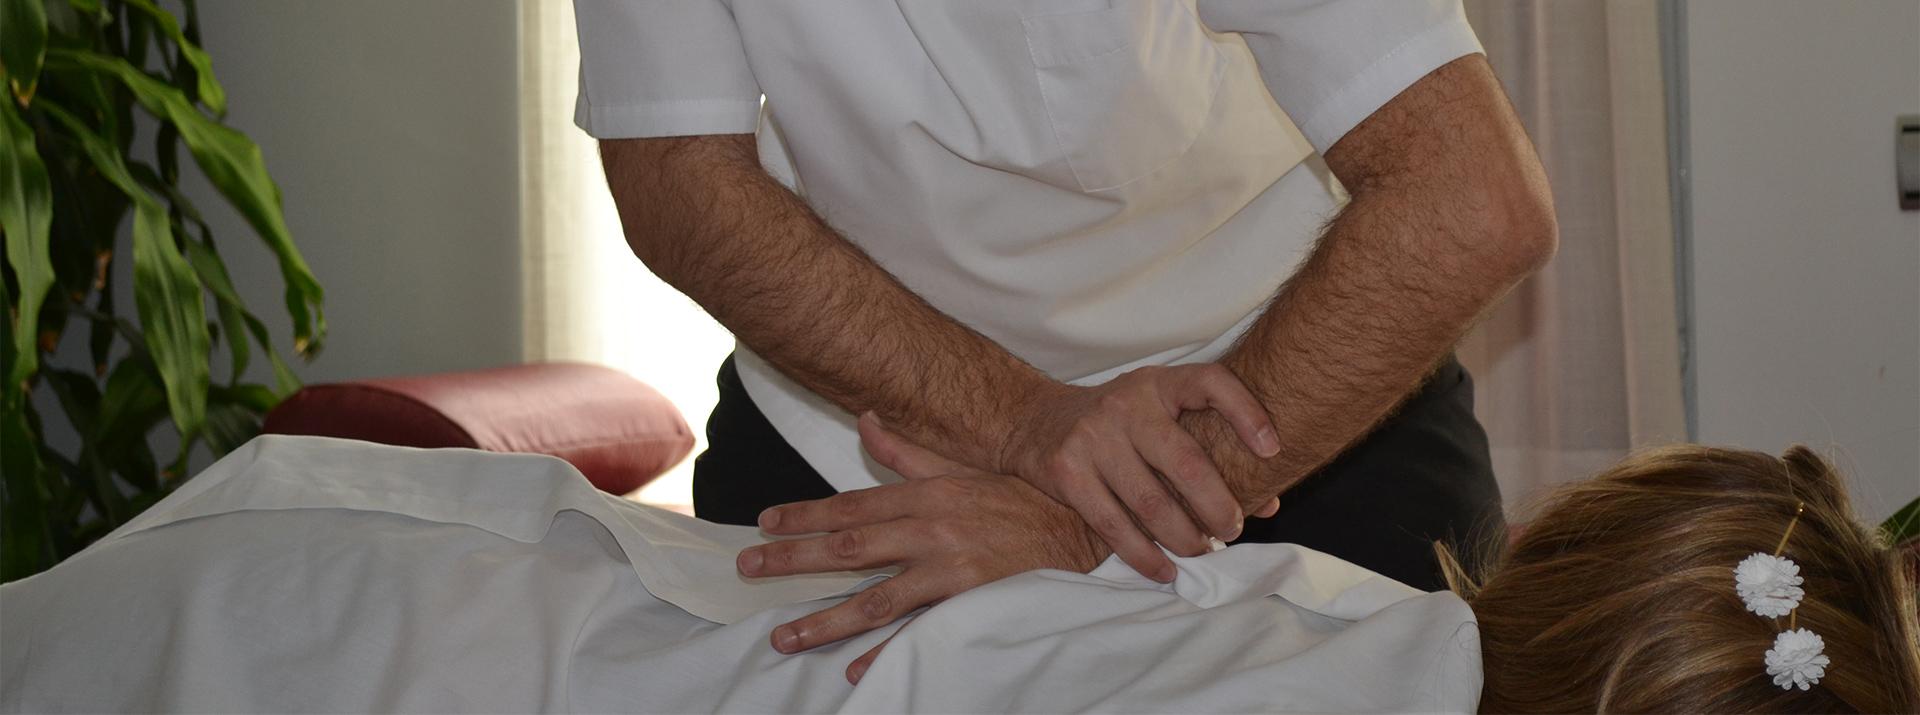 Lower Back & Neck Pain